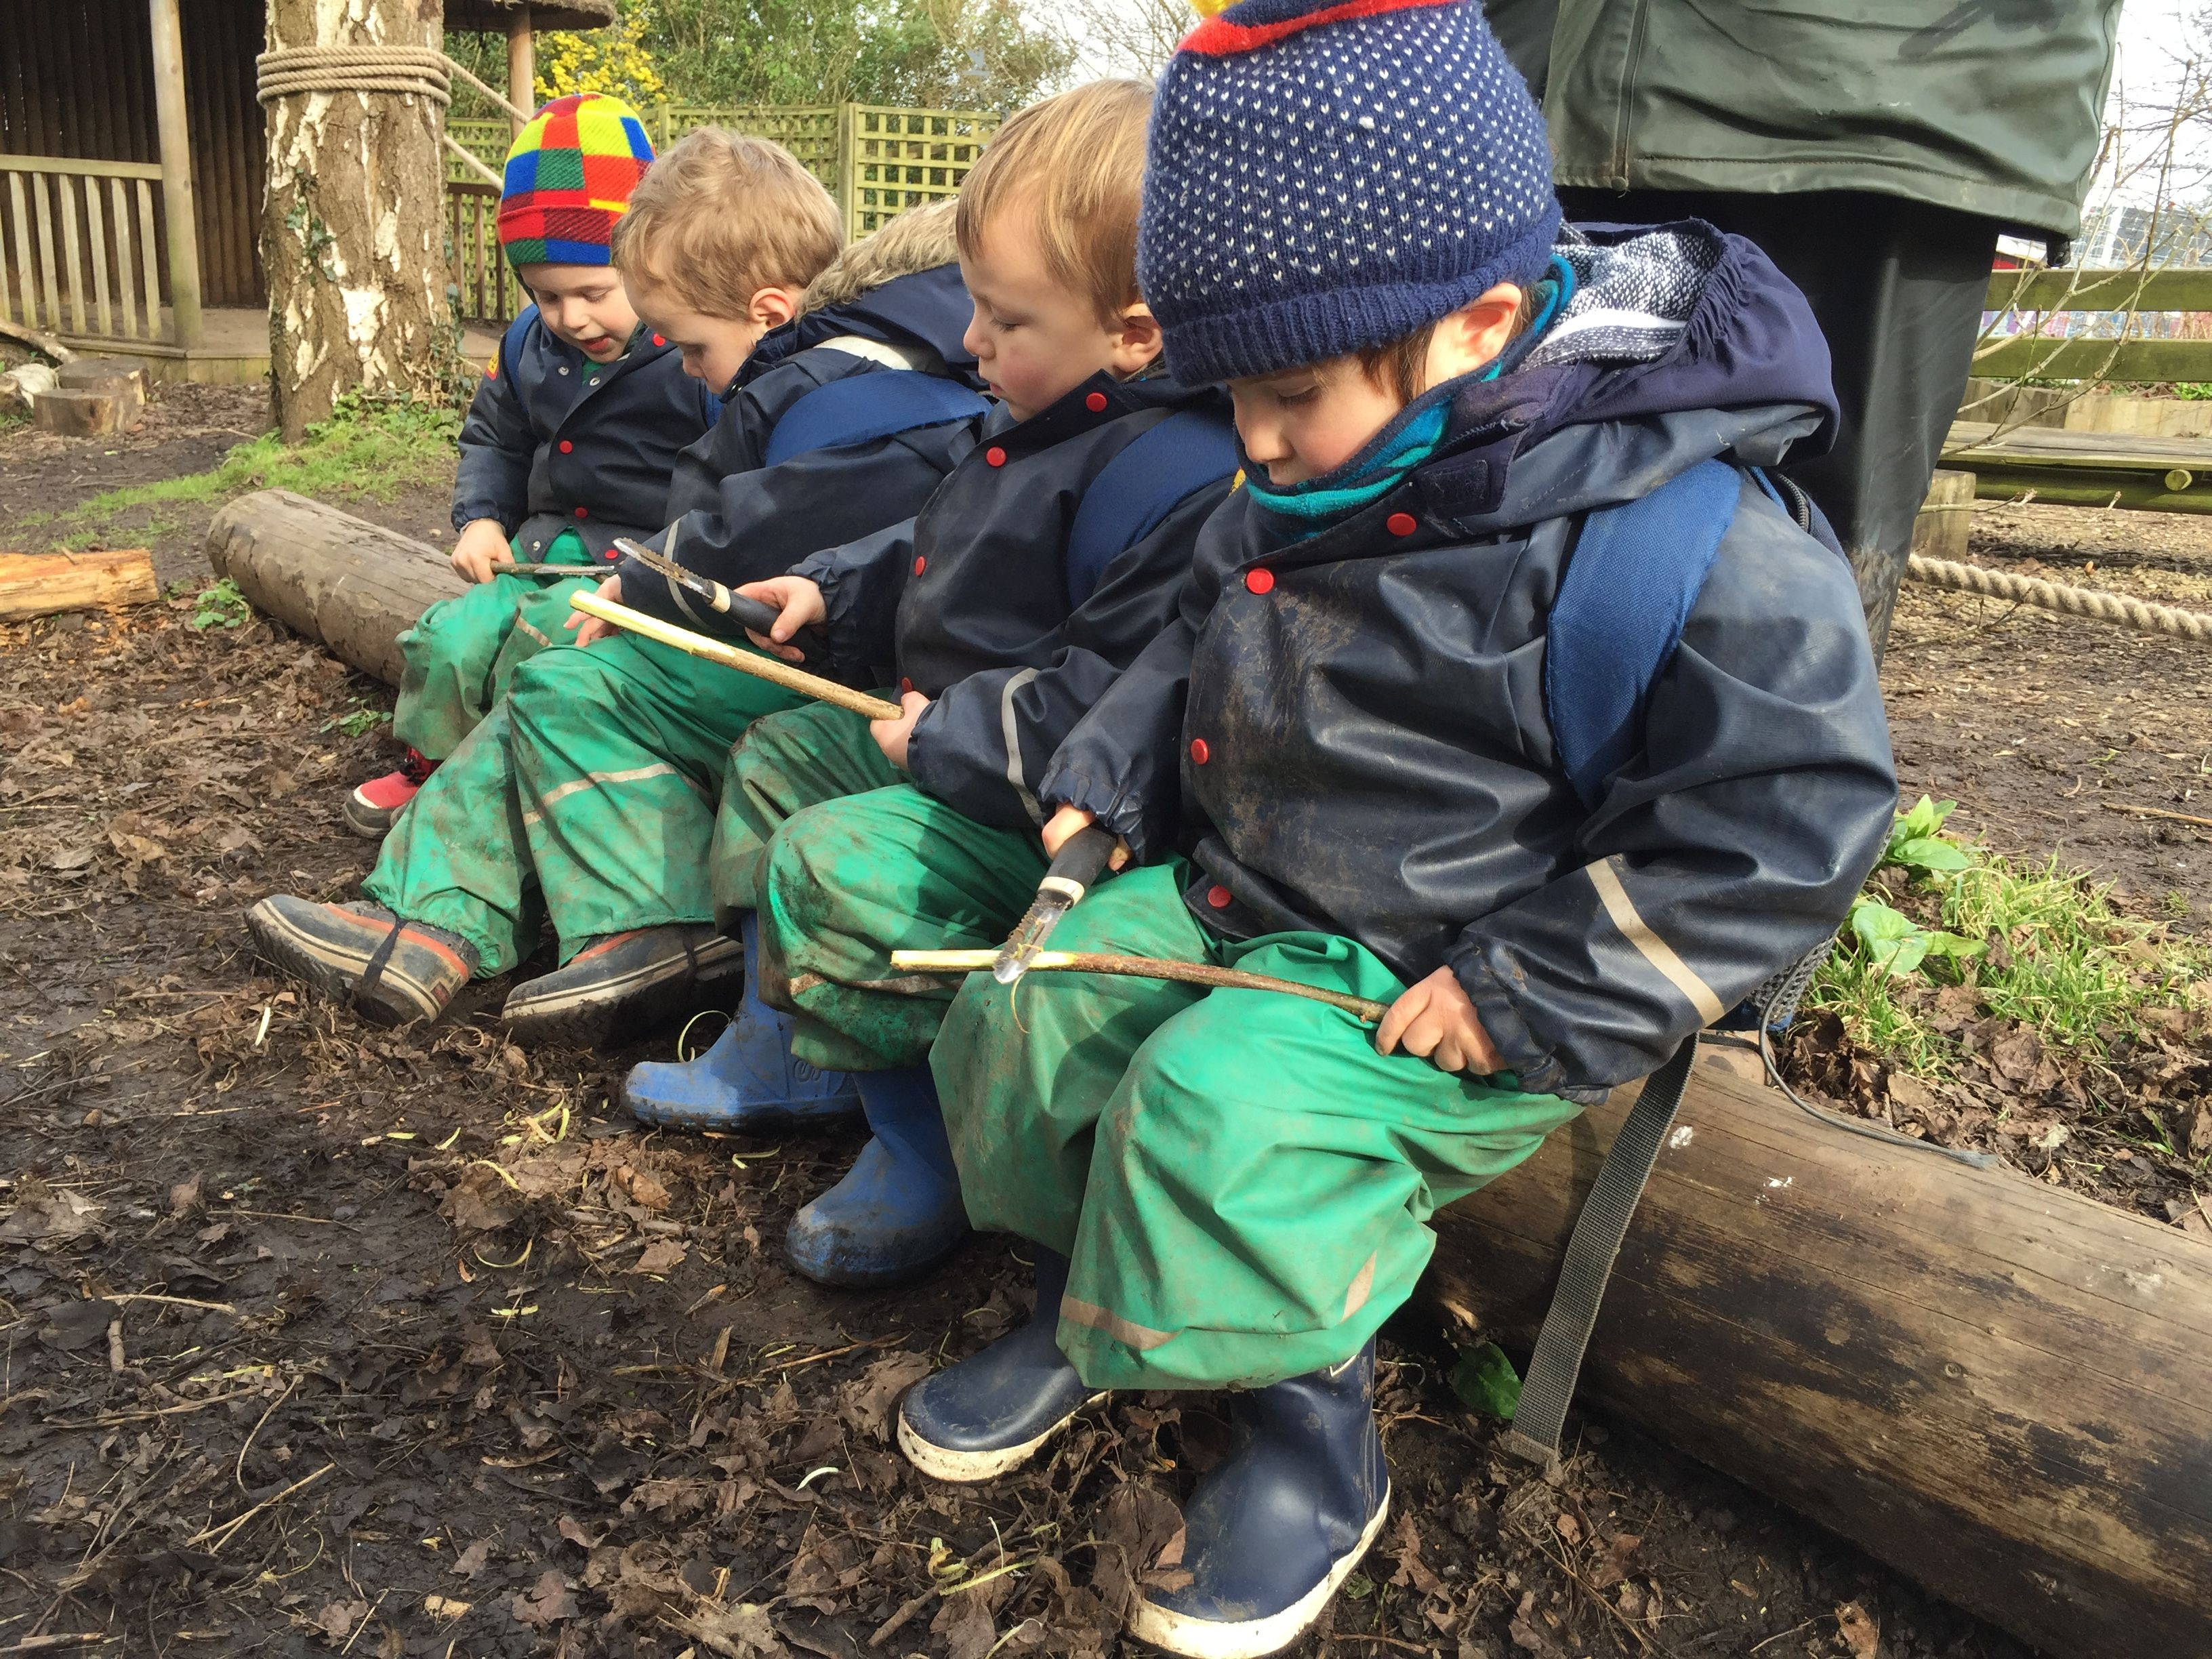 Sharpening sticks